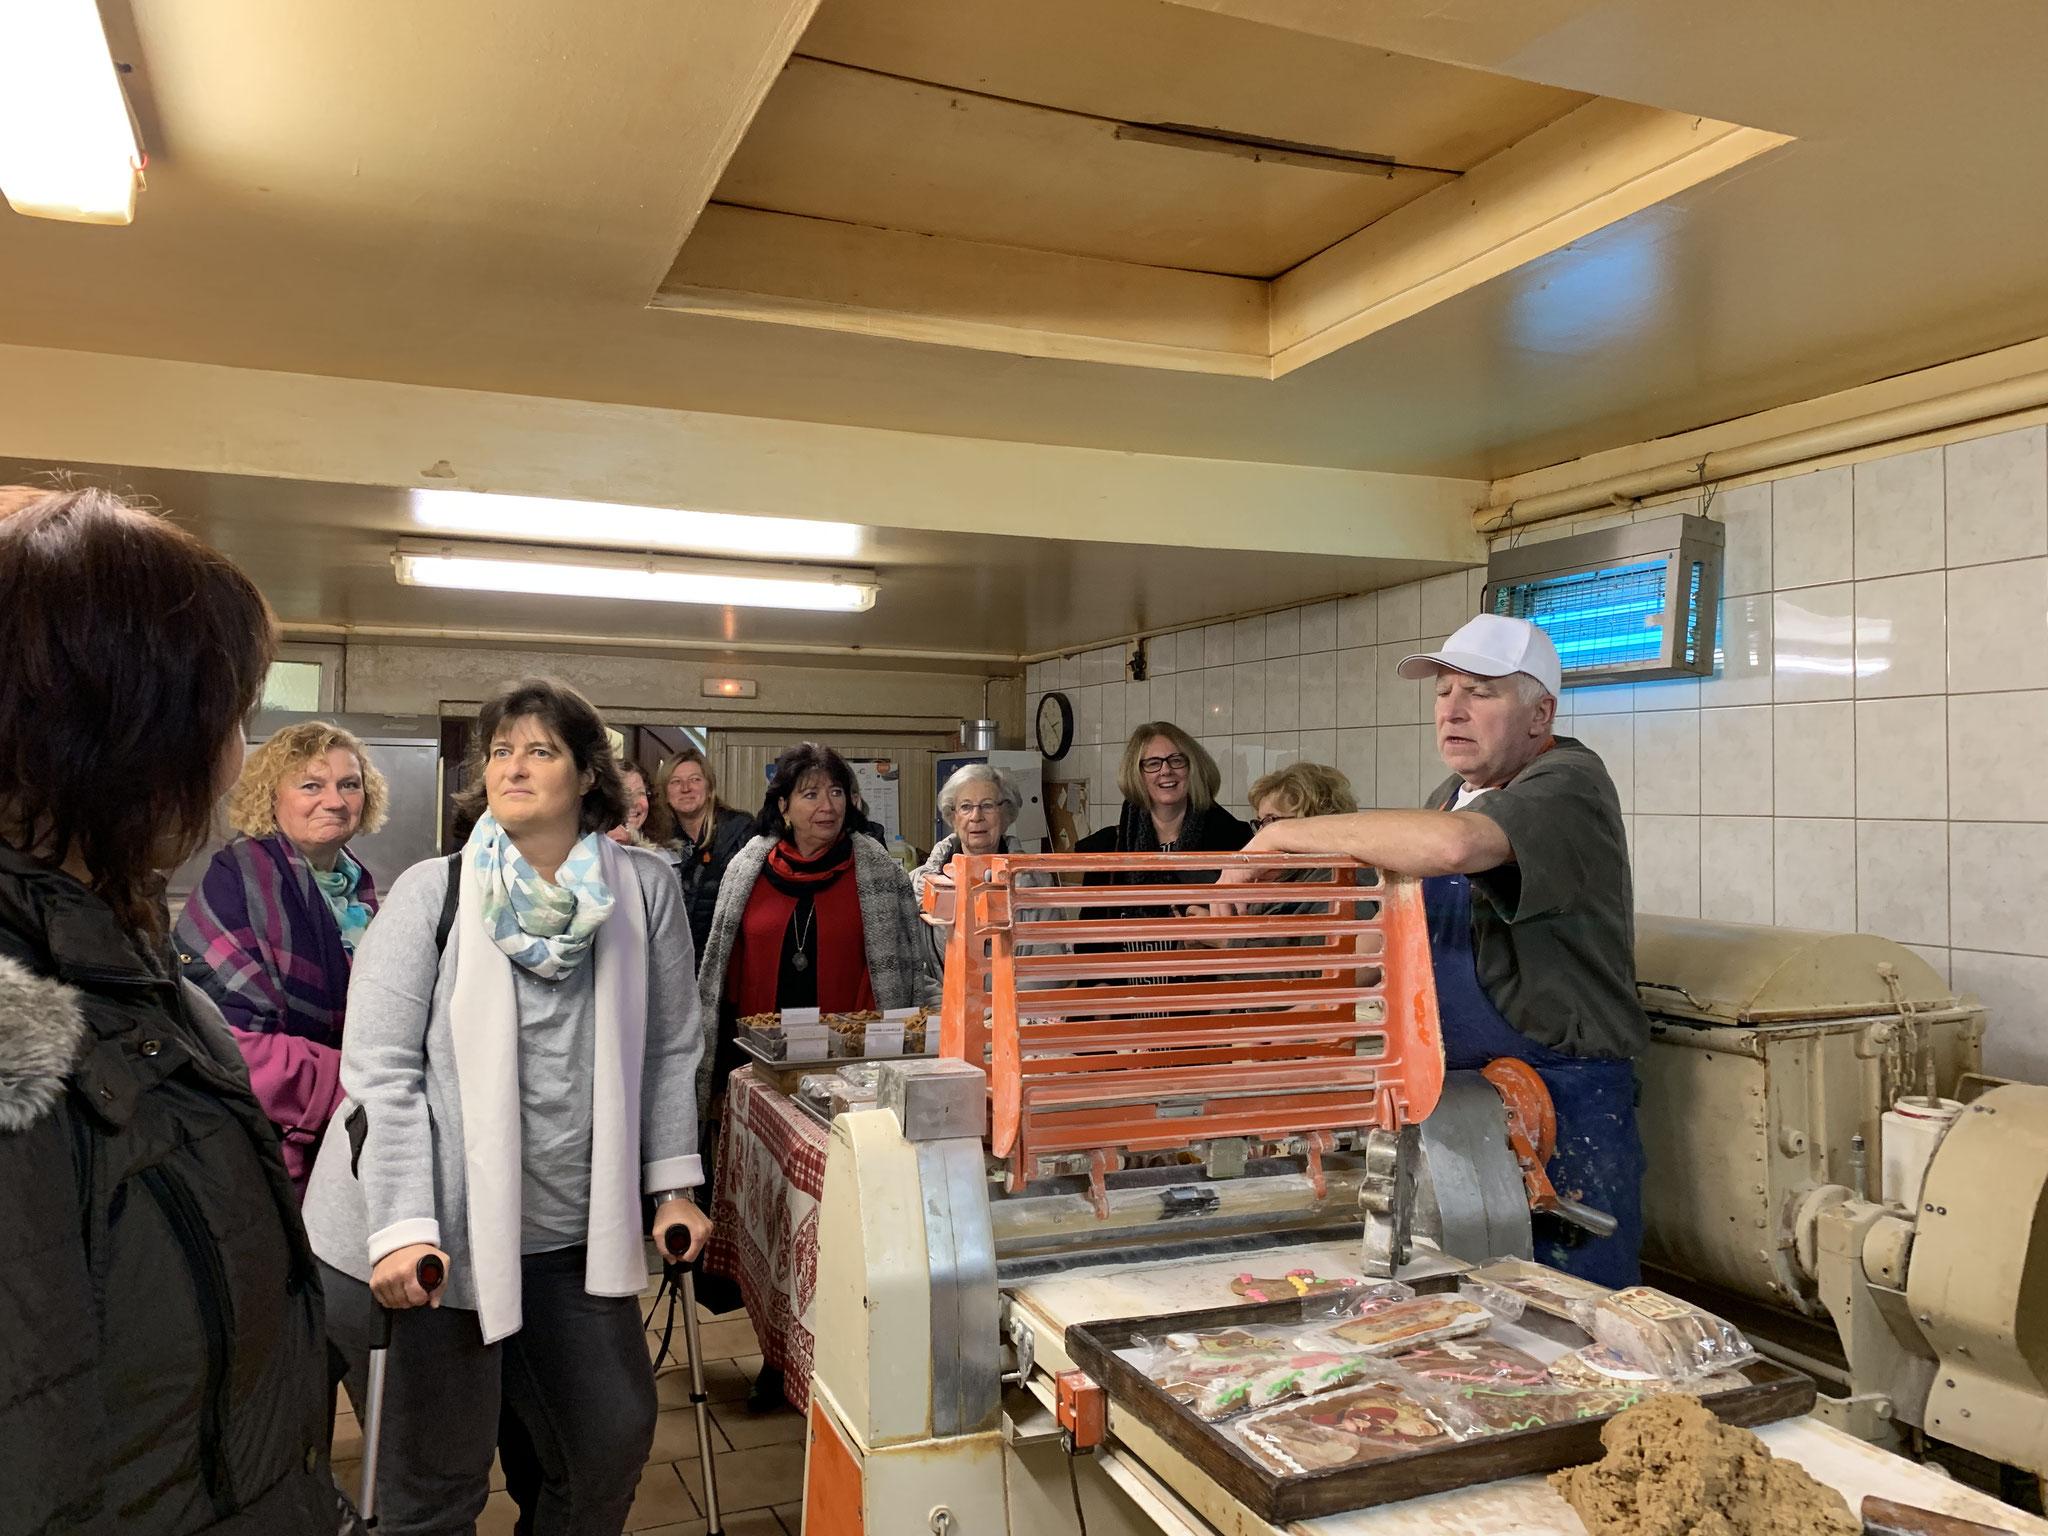 11-2018 Ausflug ins Elsass - Besichtigung Lebkuchenbäckerei Lips